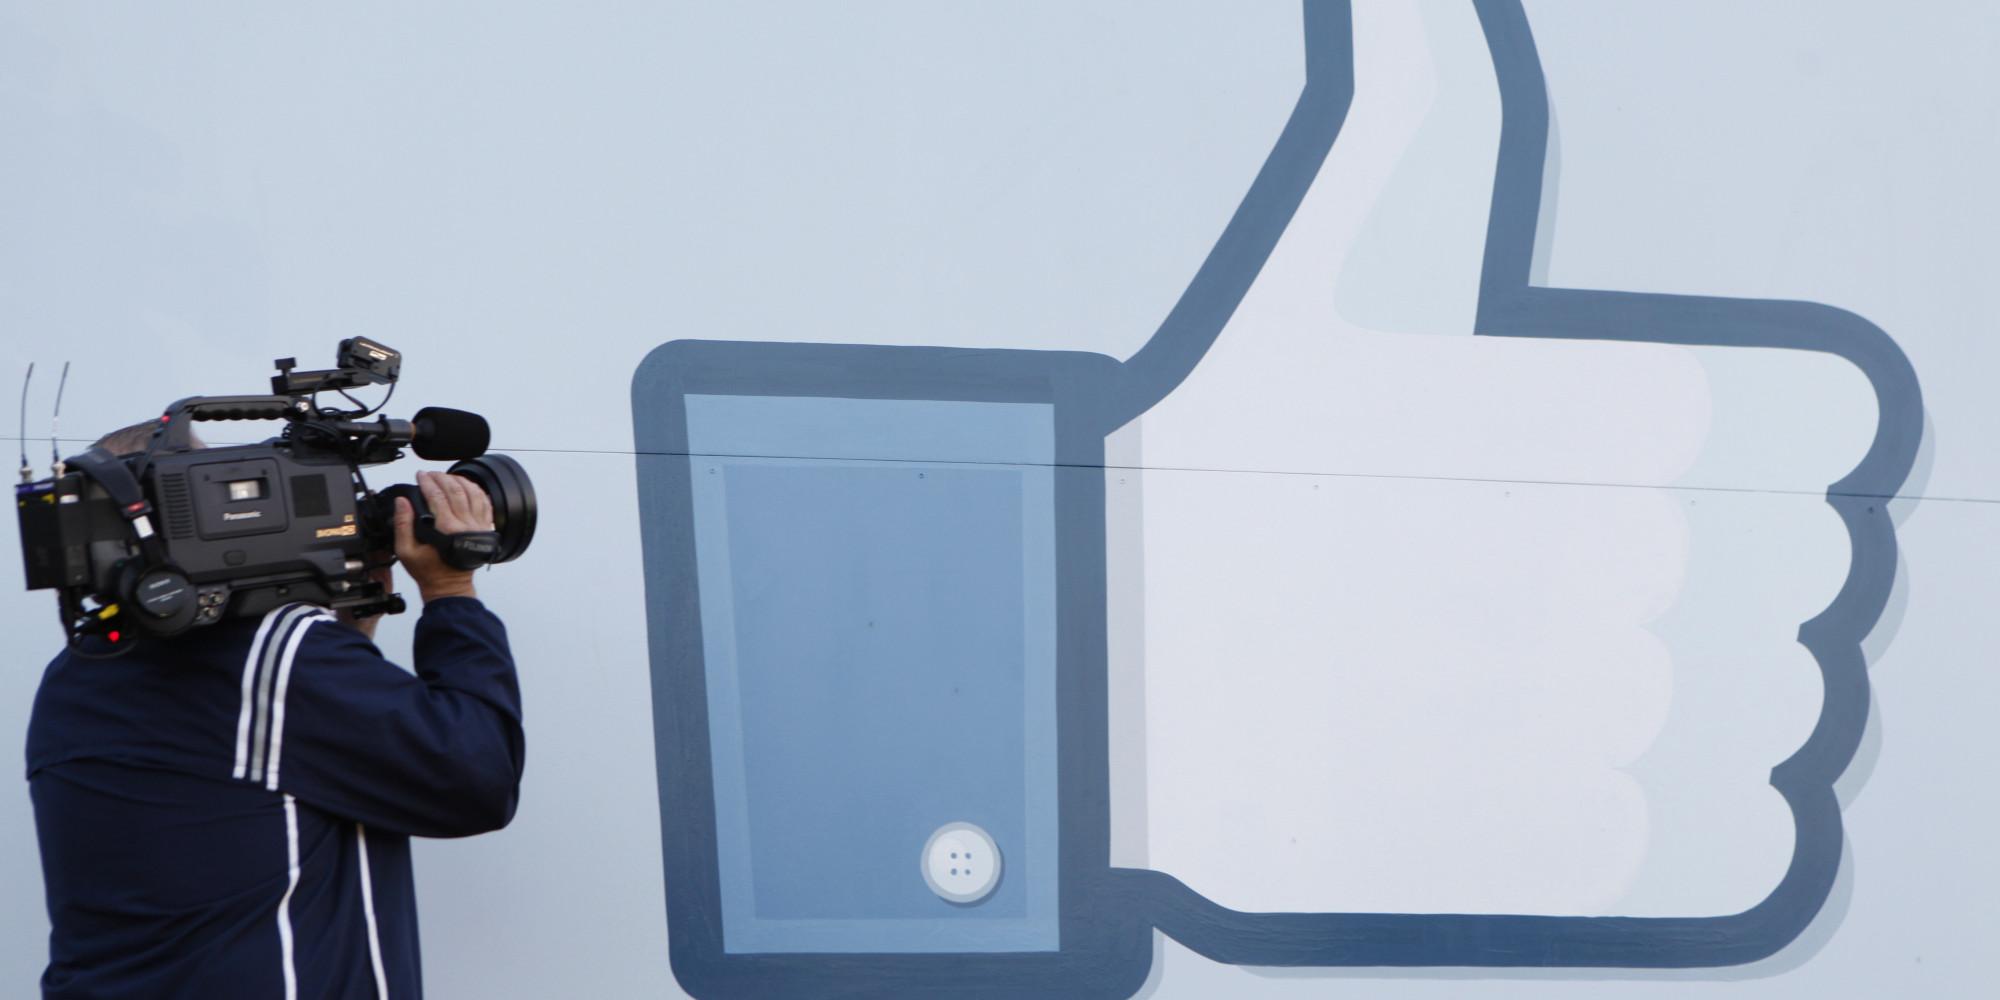 Facebook Is Under Investigation For Mood Manipulation Study